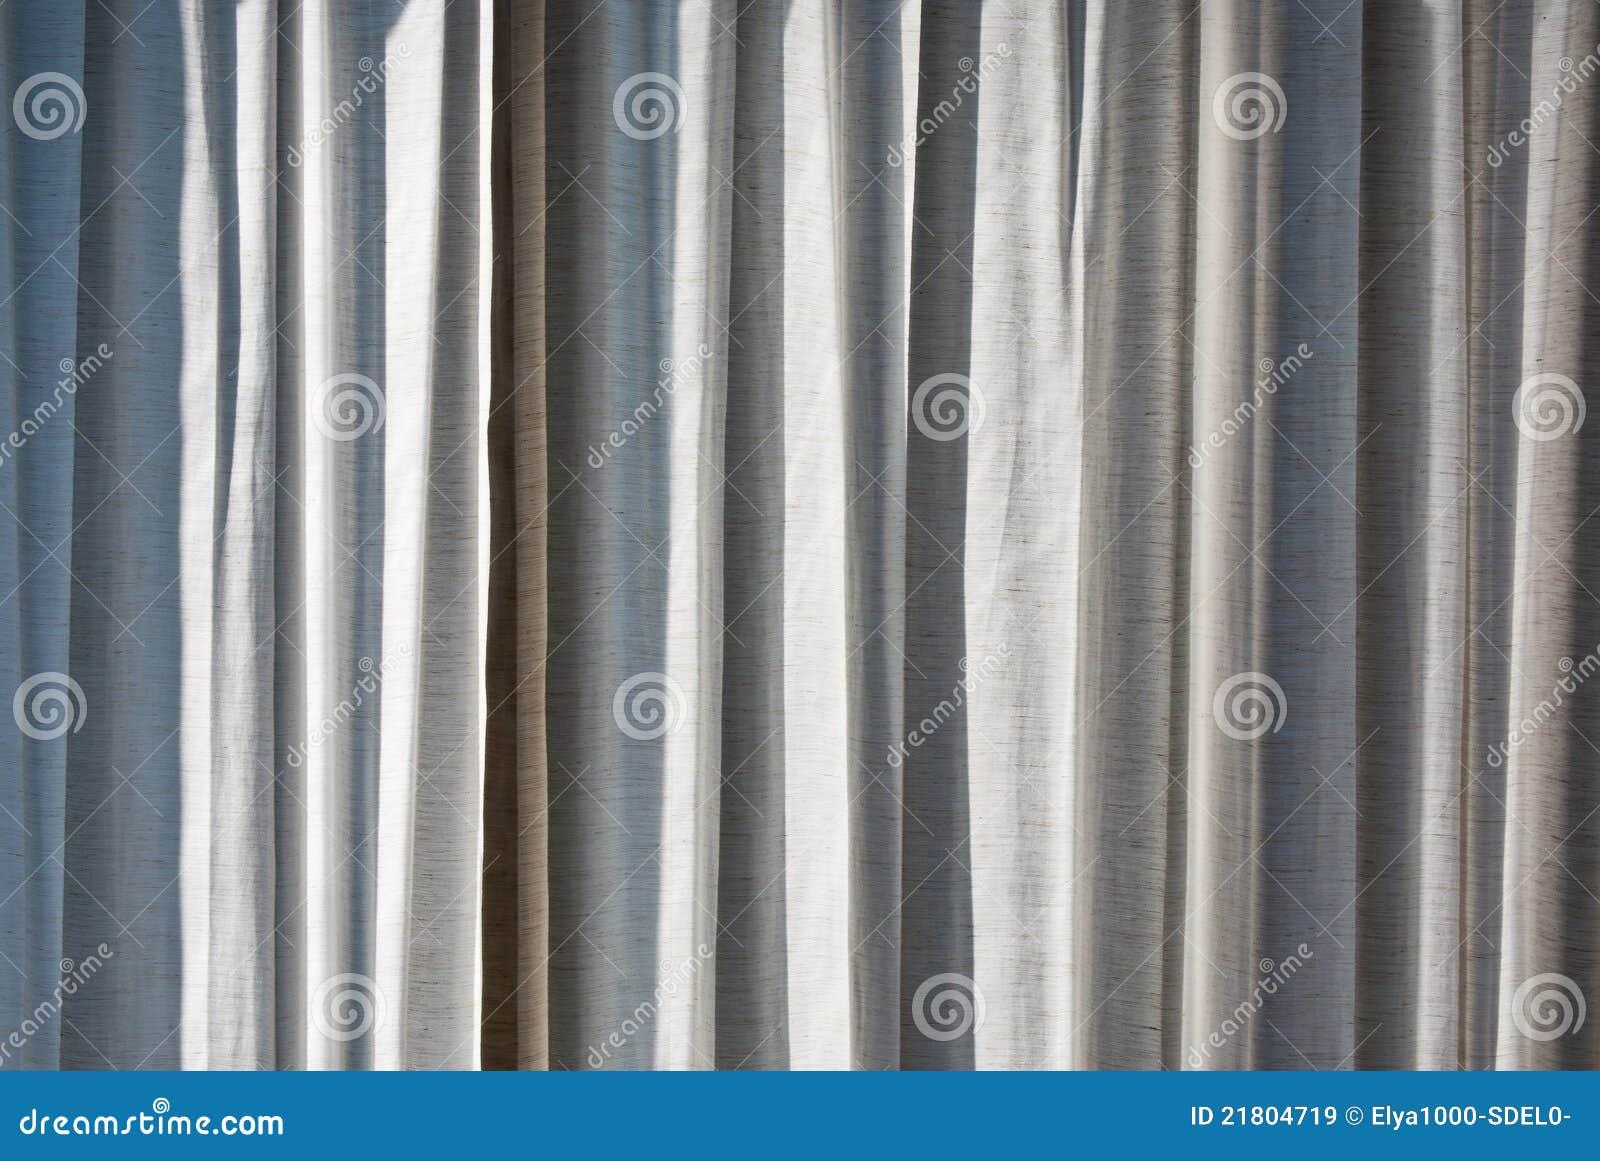 Cortinas grises im genes de archivo libres de regal as for Cortinas grises